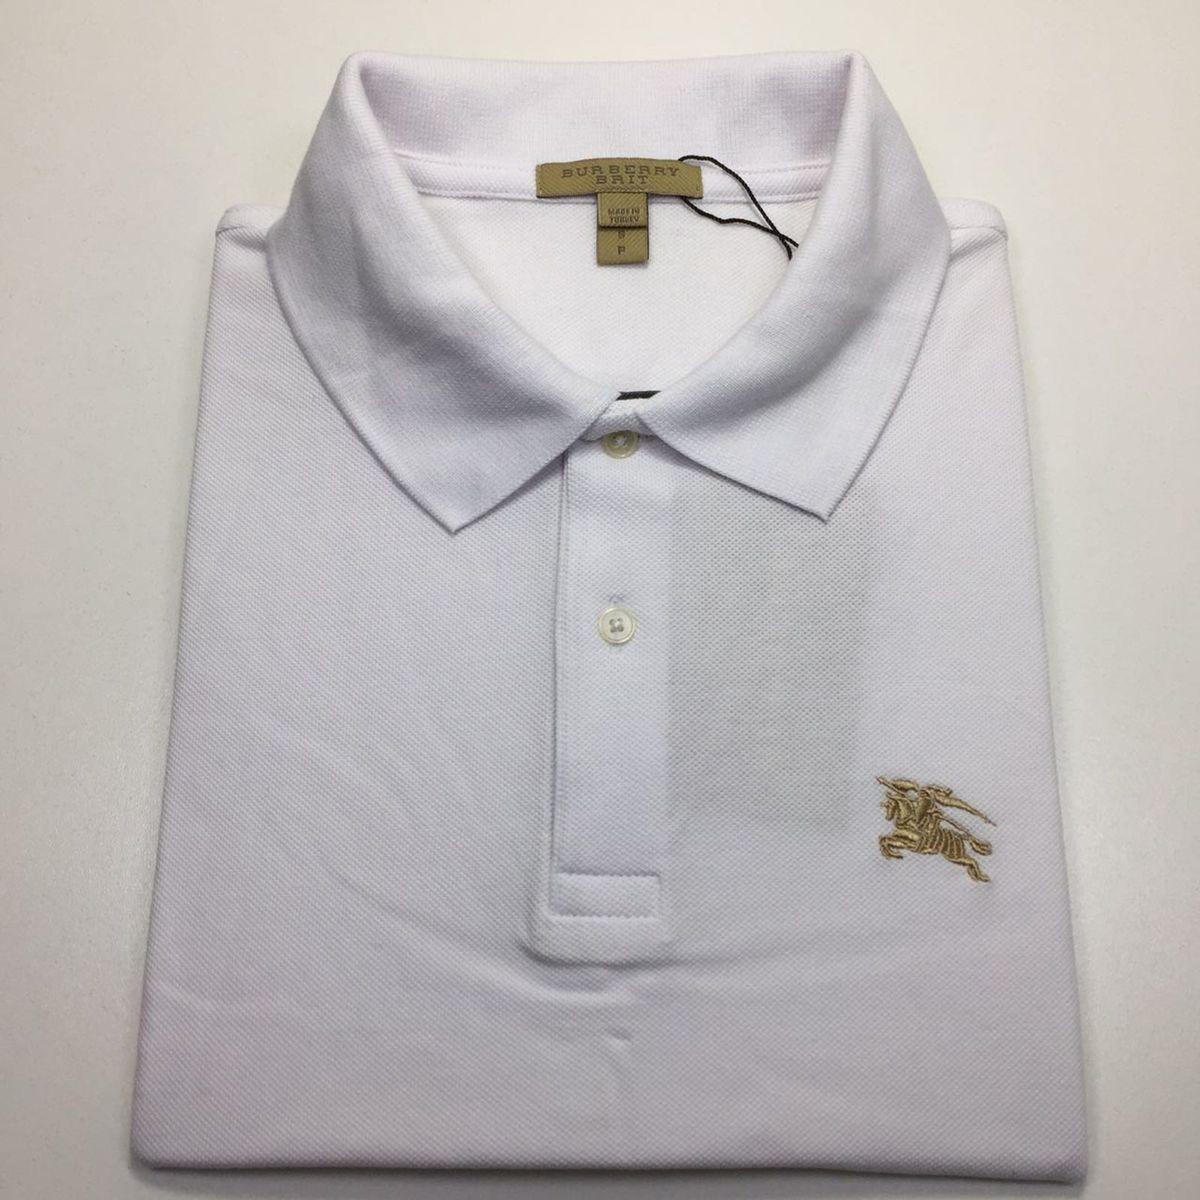 Camiseta Polo Burberry Brit Original  247afa0d353d0